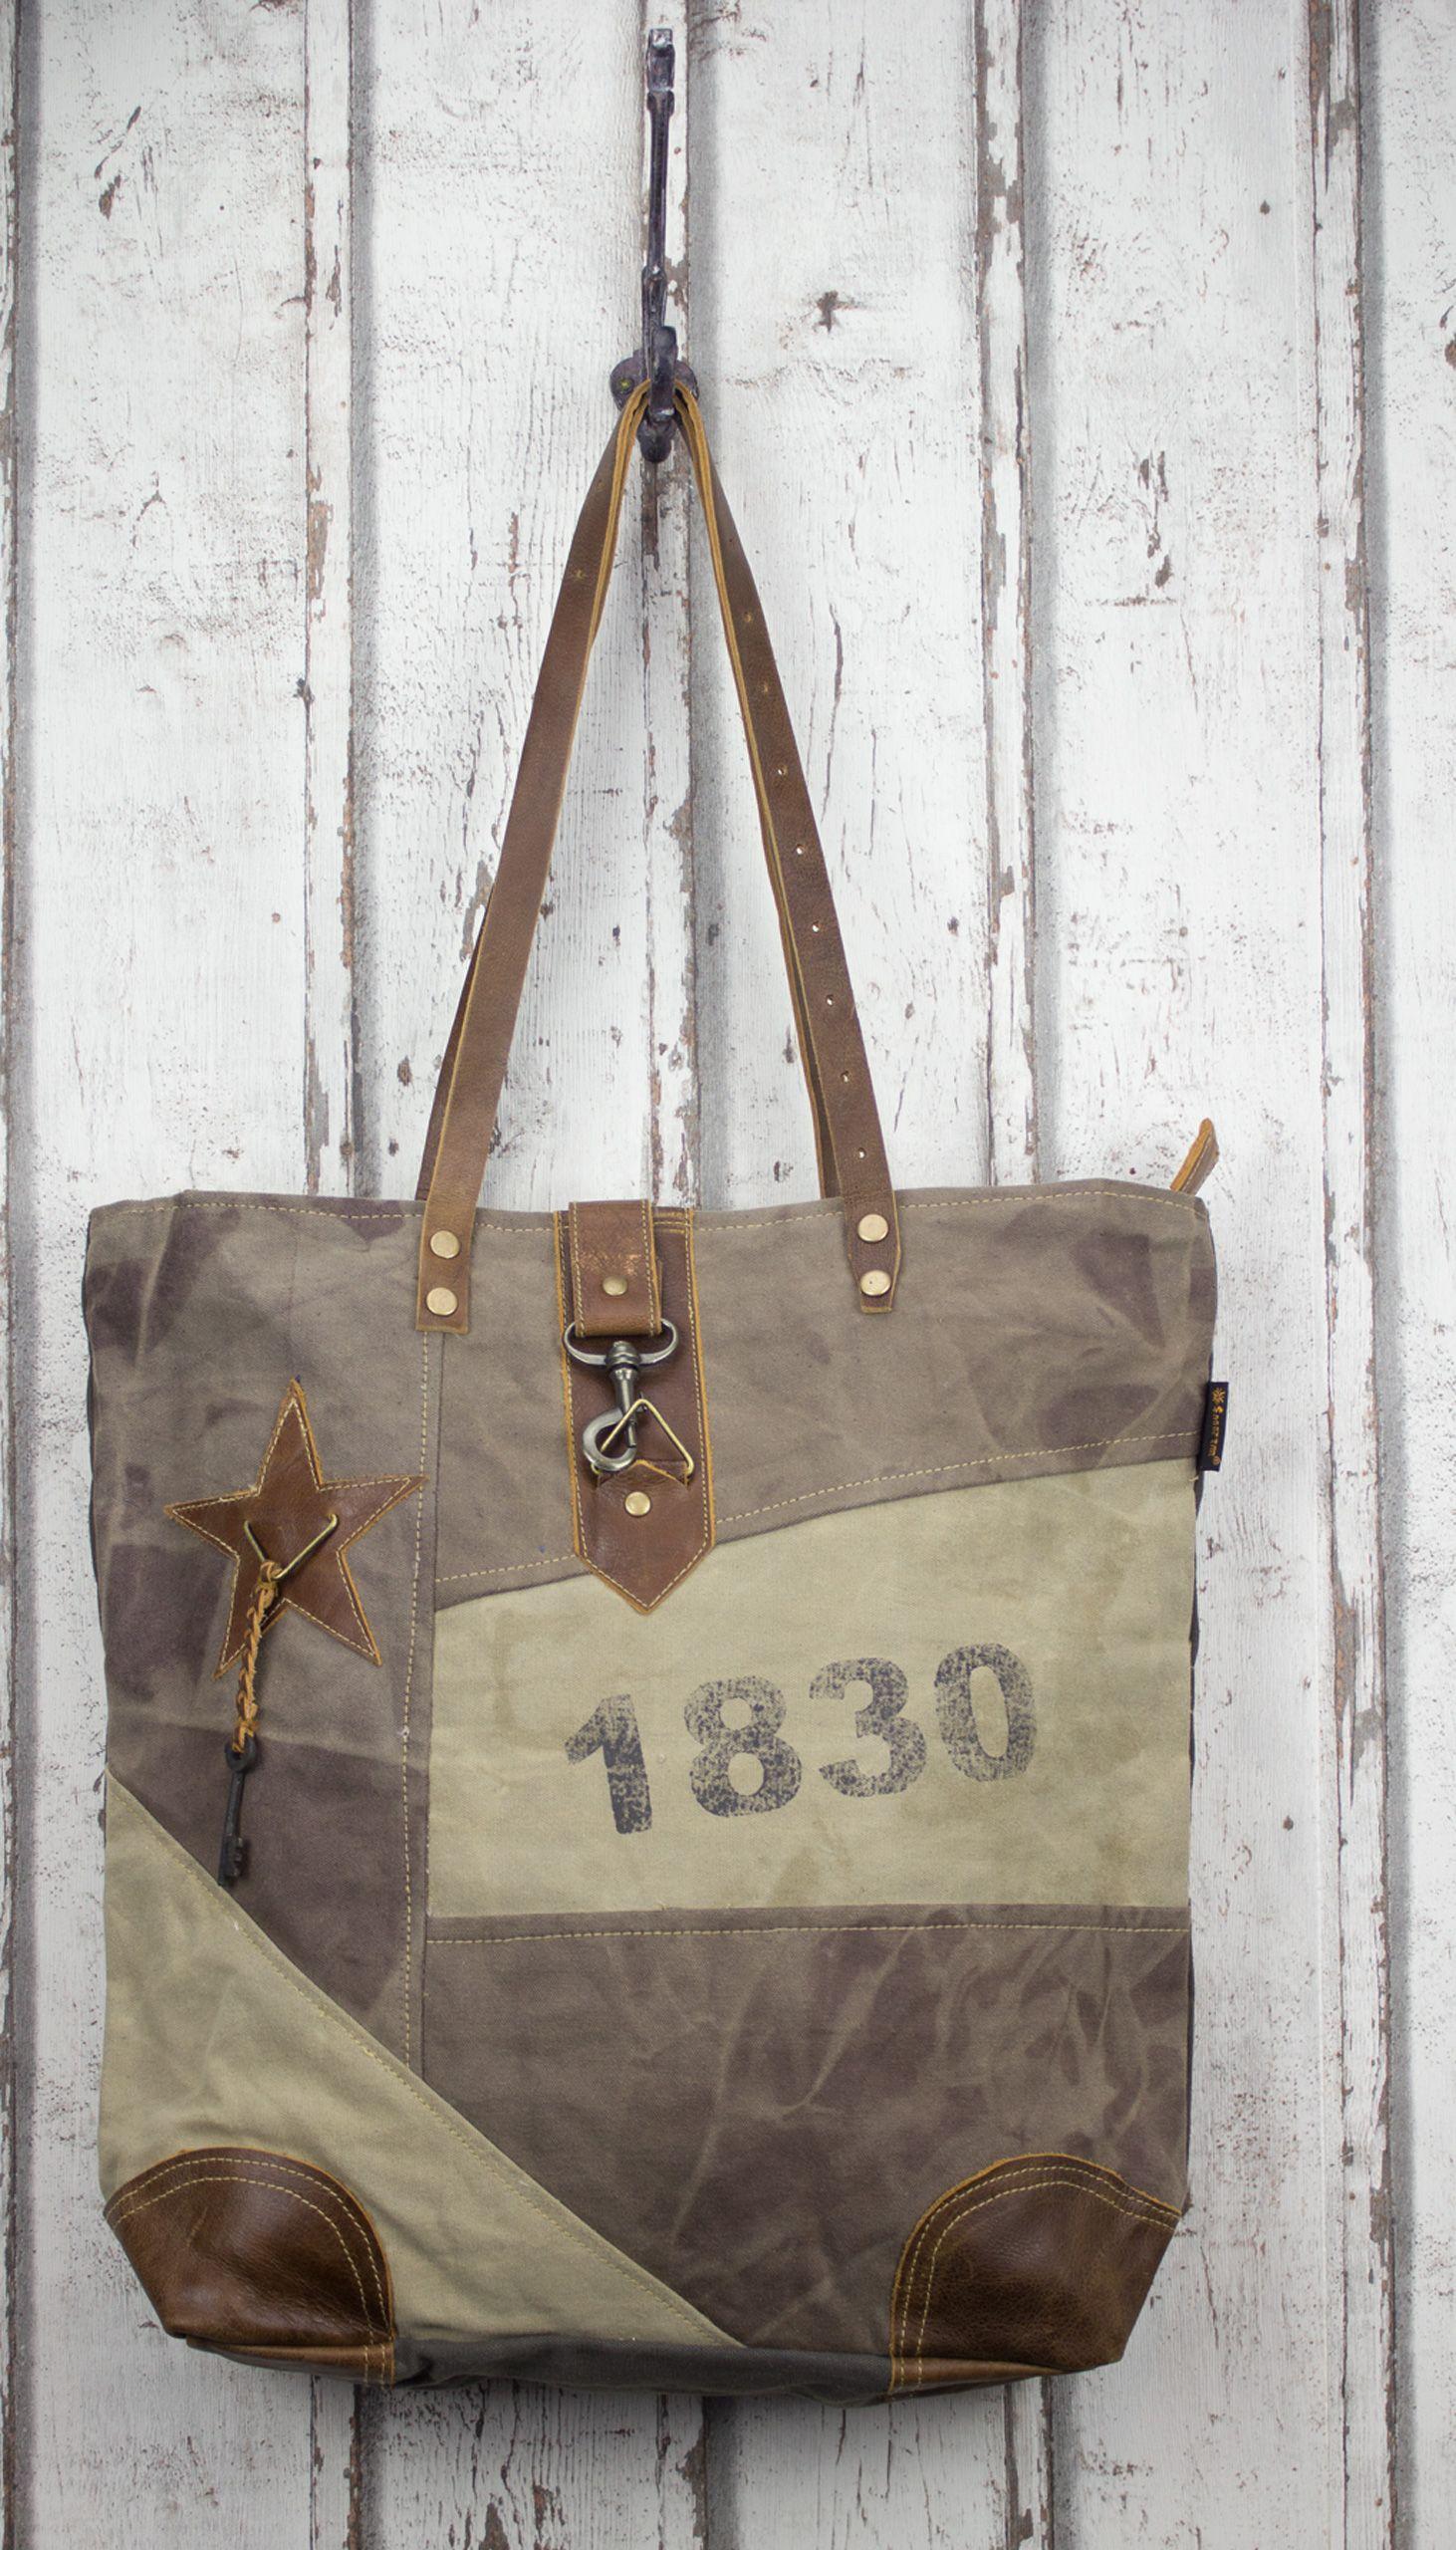 efa748ca7a6da Sunsa Vintage Tasche Retro Canvas Handtasche Schultertasche Shopper  Canvastasche Ledertasche Leder